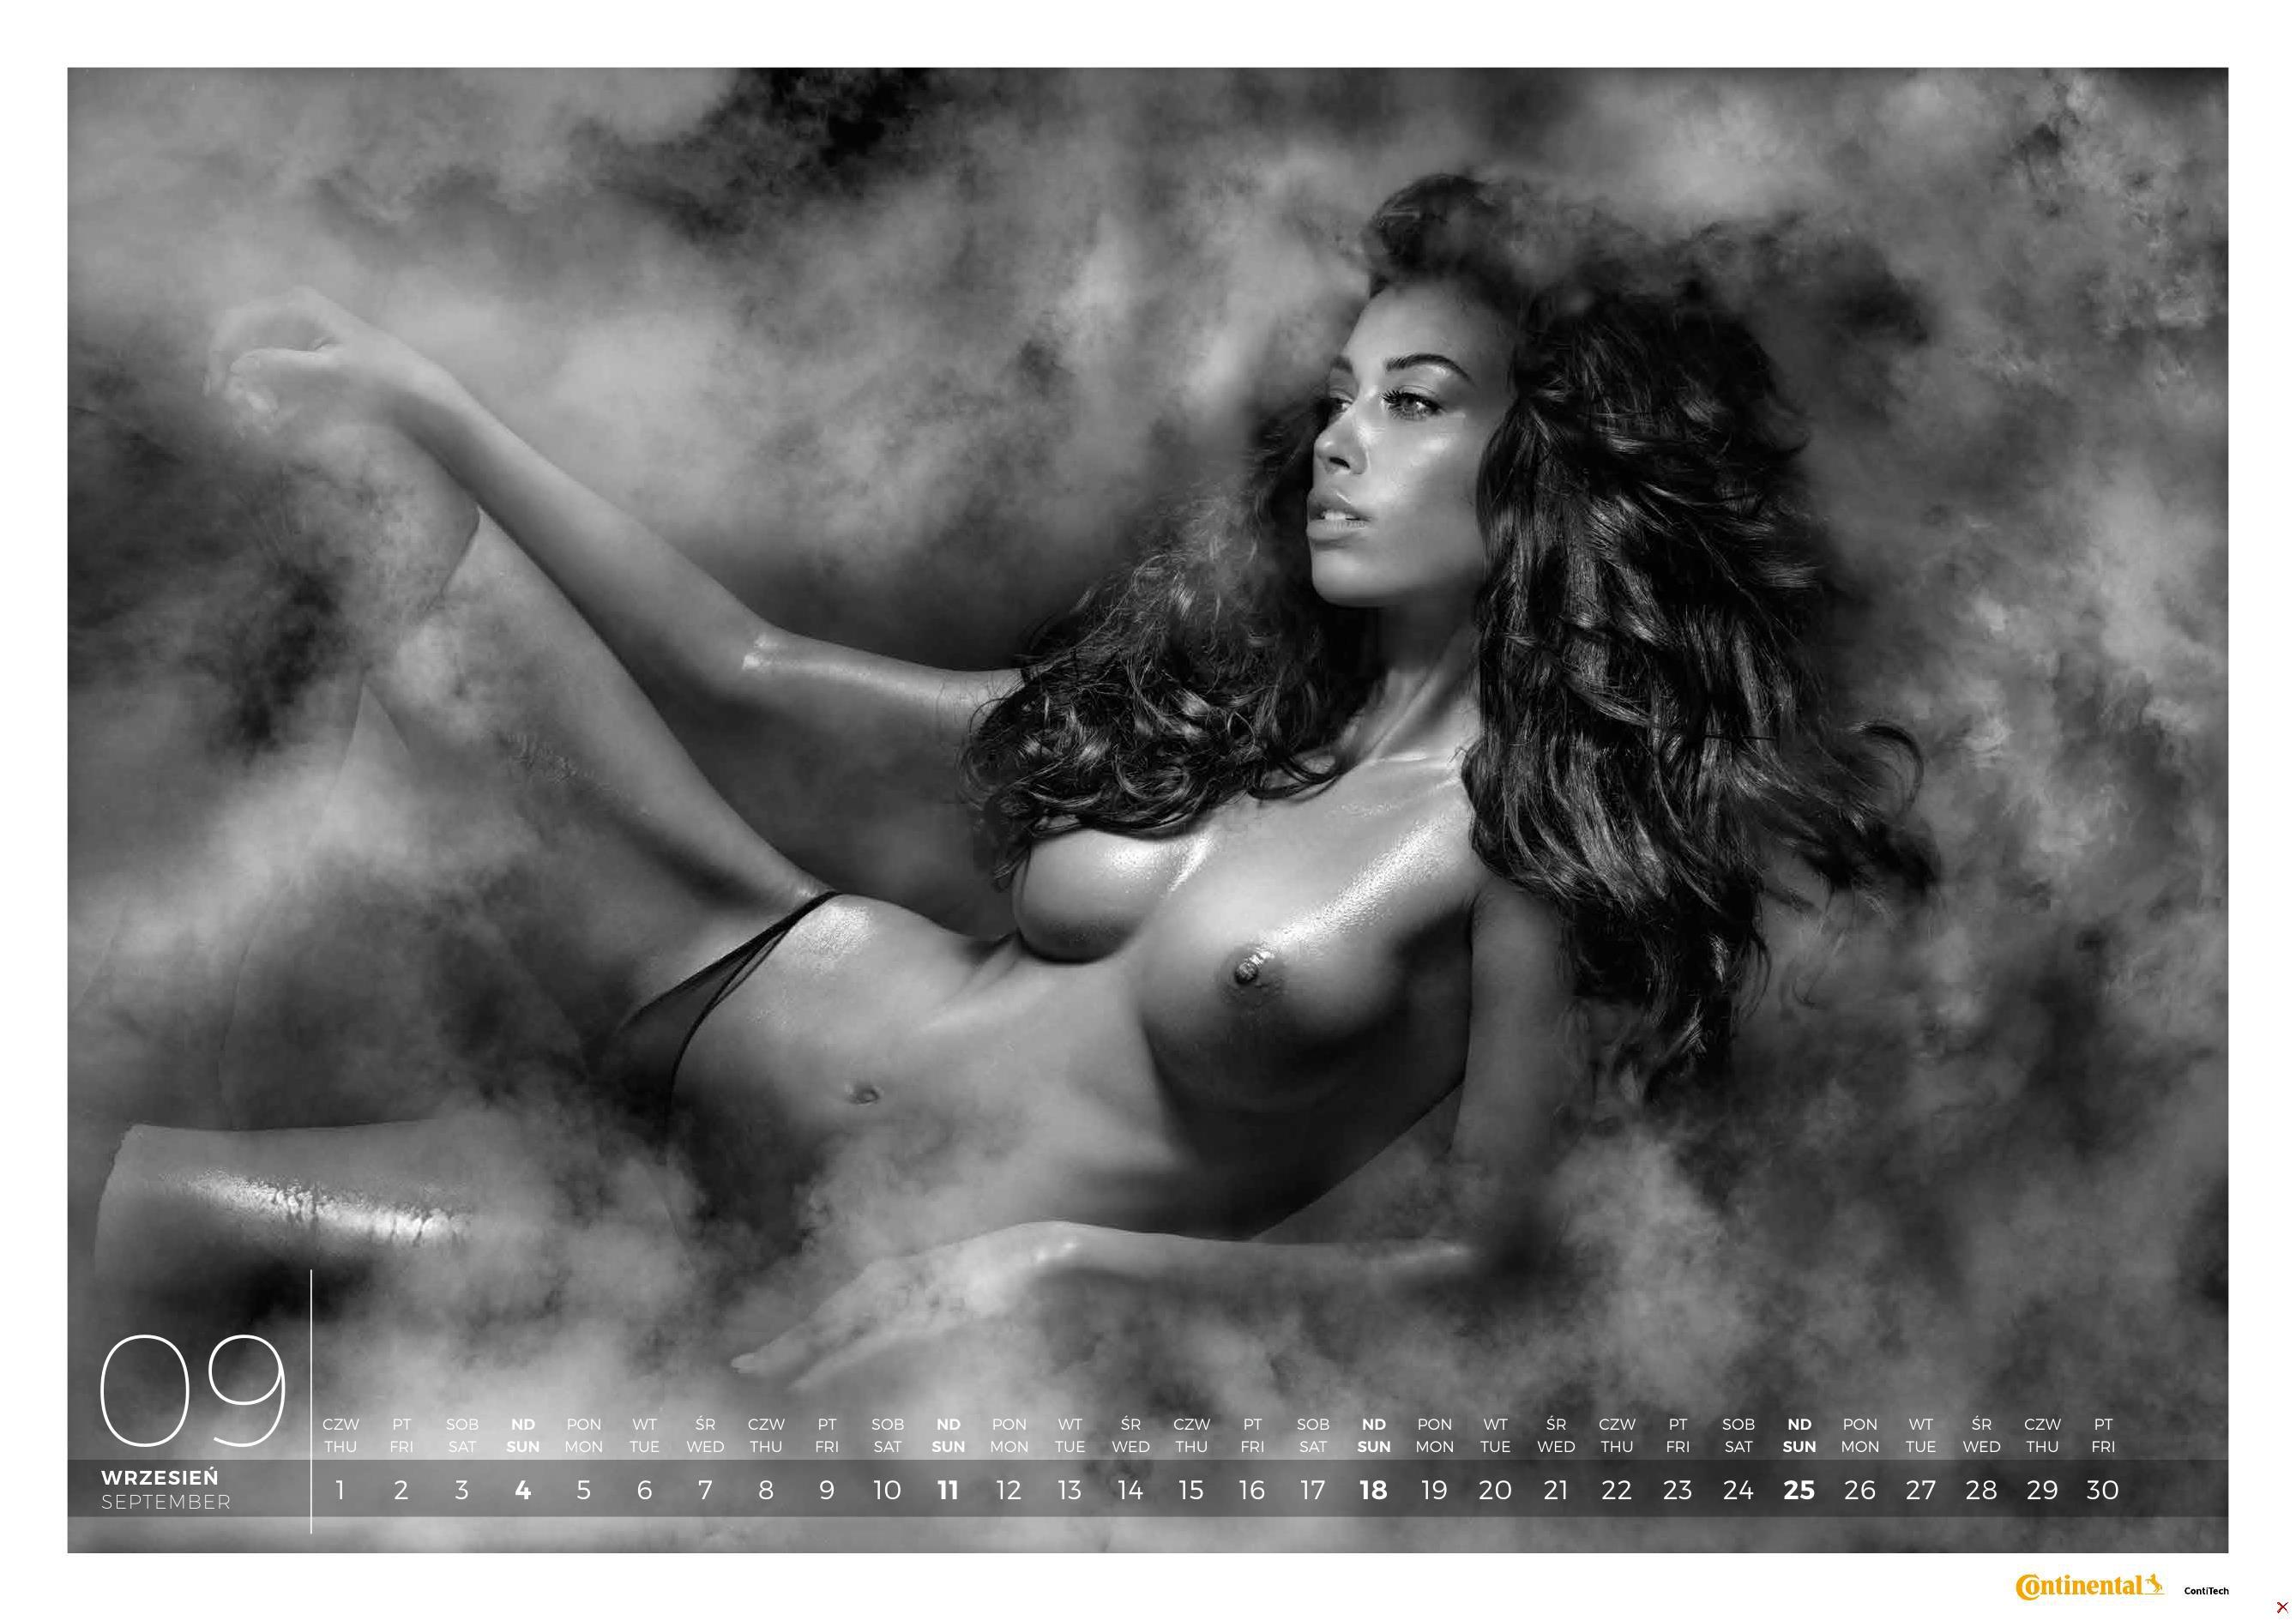 eroticheskiy-kalendar-foto